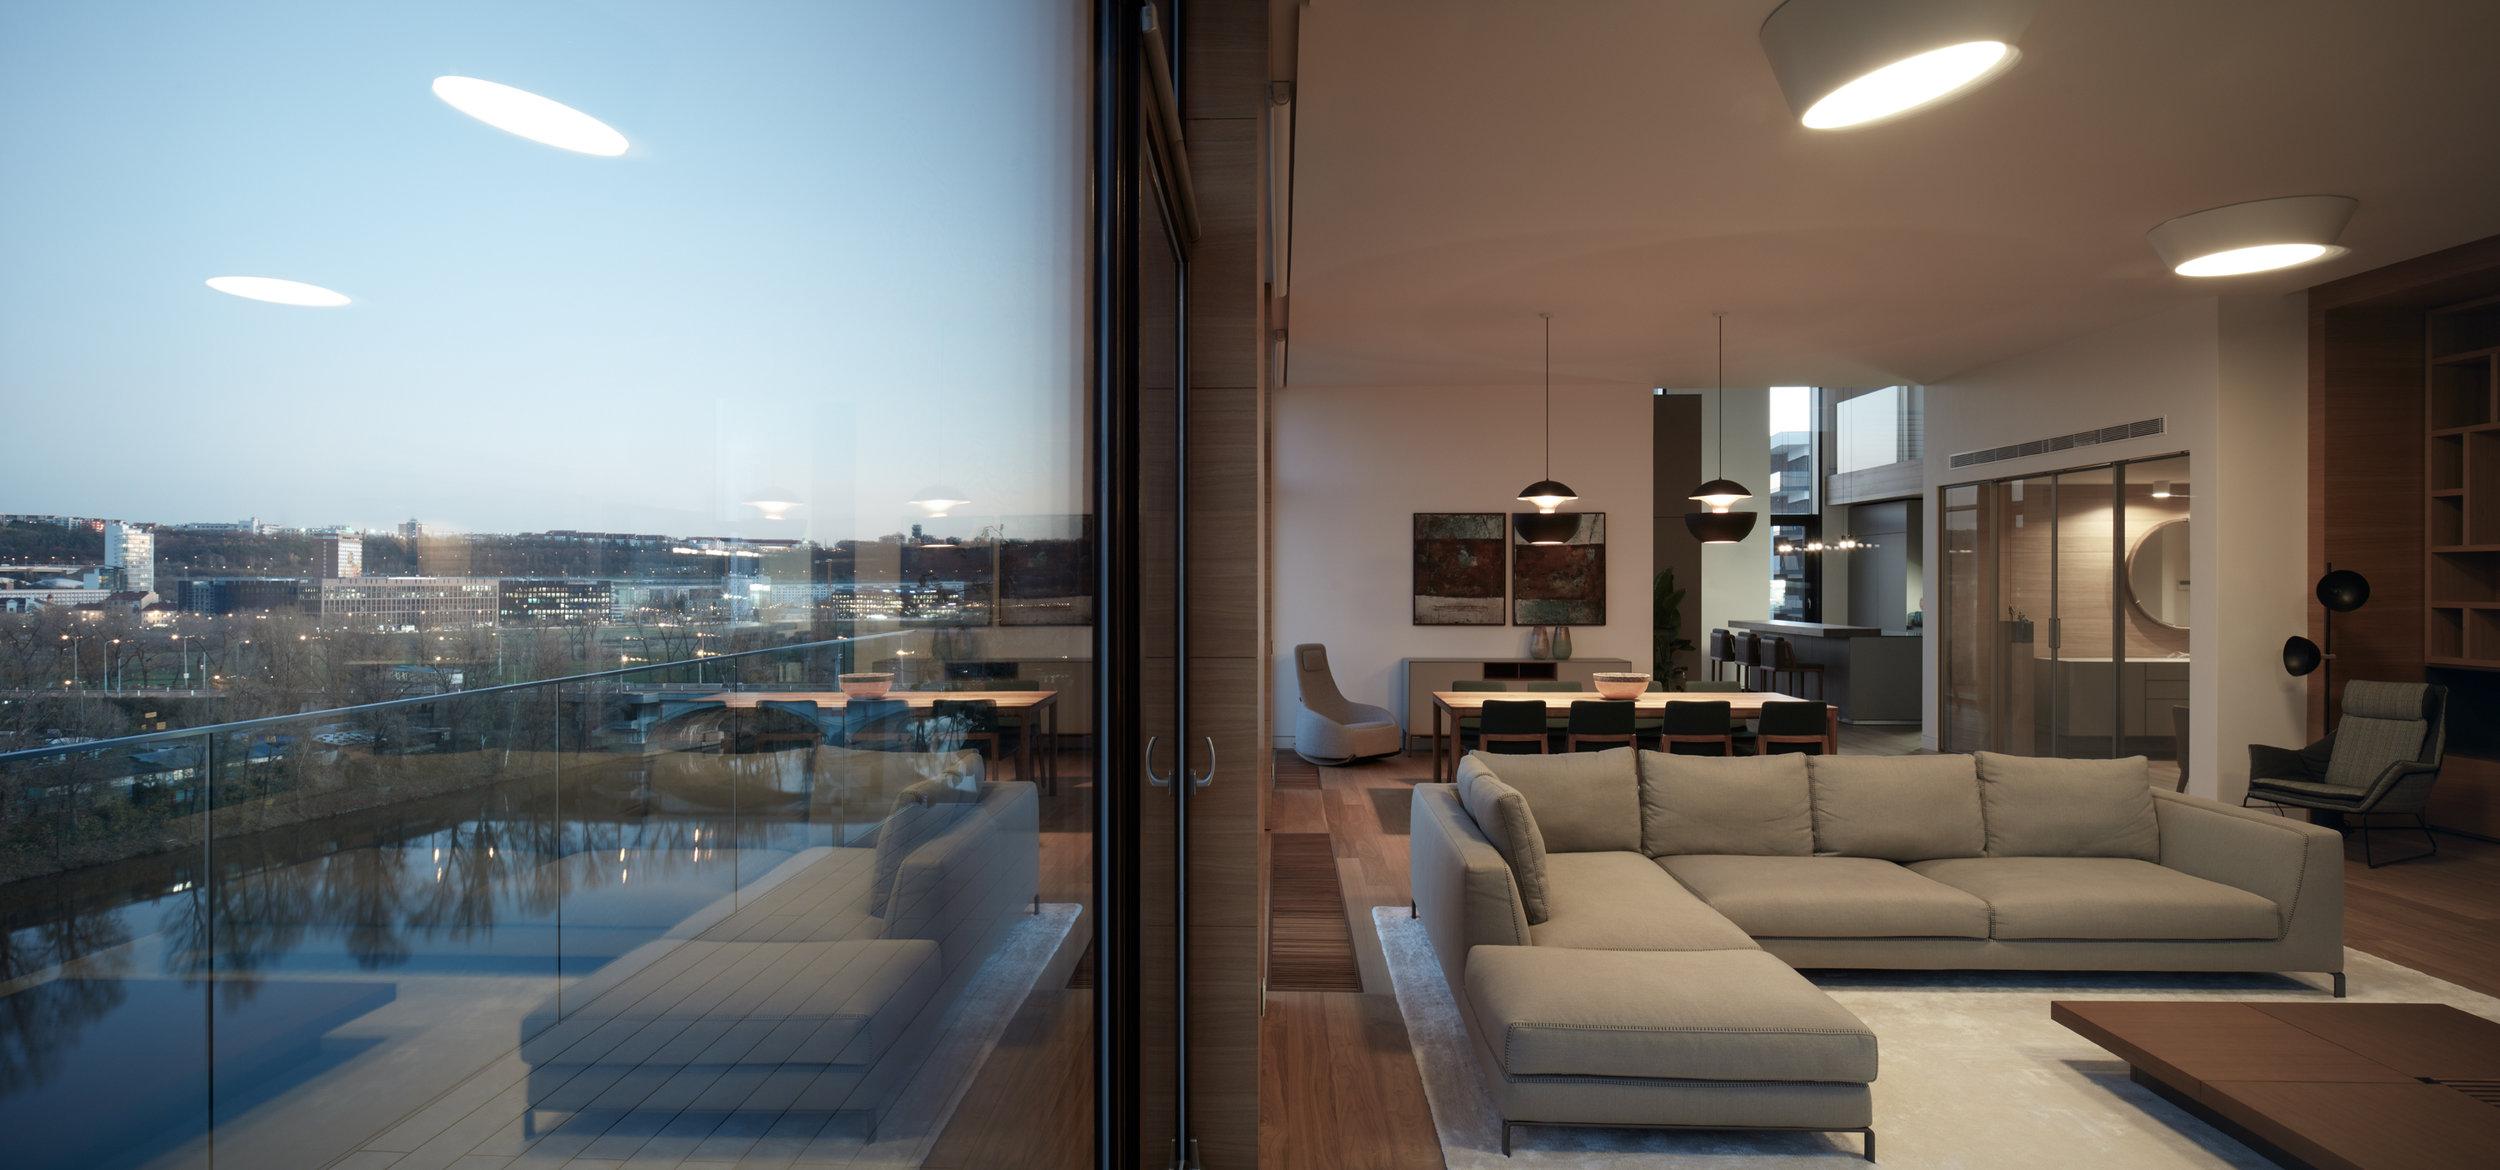 Go_Architects_Marina_Island_BoysPlayNice_15.jpg